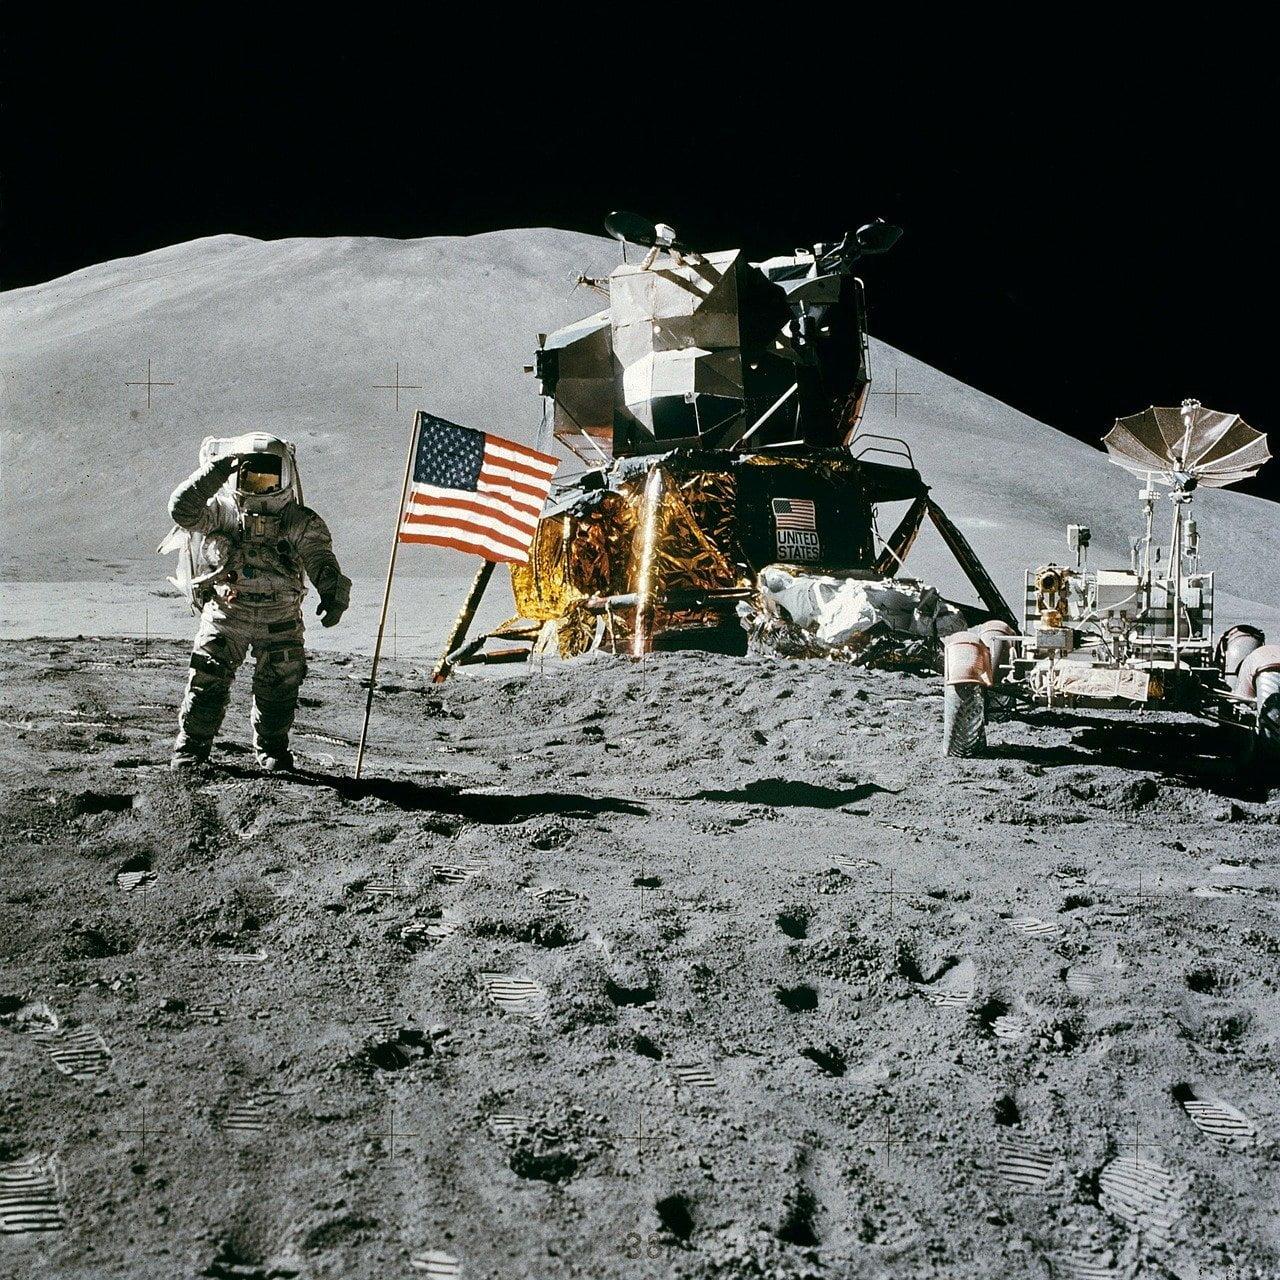 space station, moon landing, apollo 15